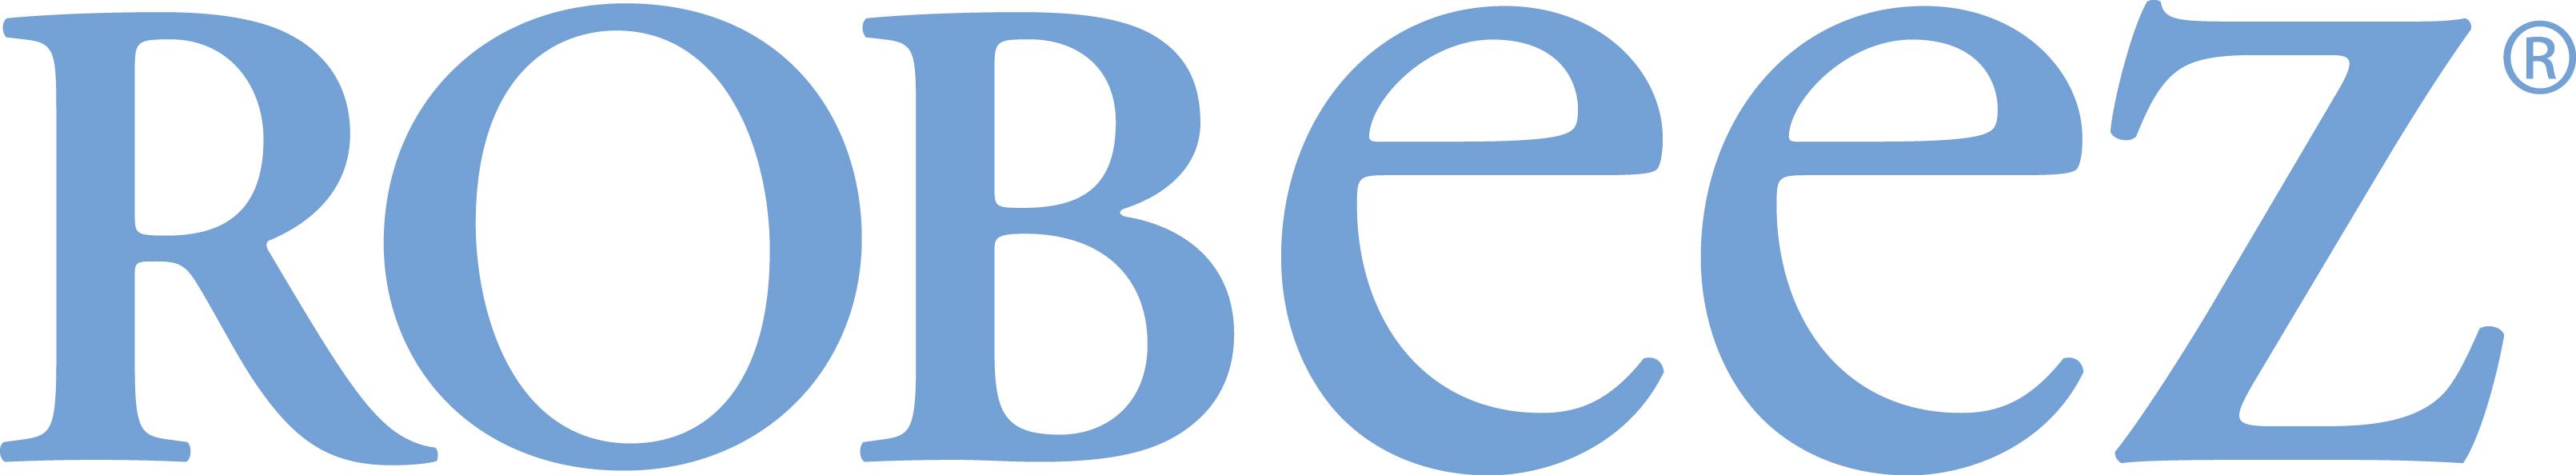 File:Robeez-Logo.jpg - Wikipedia